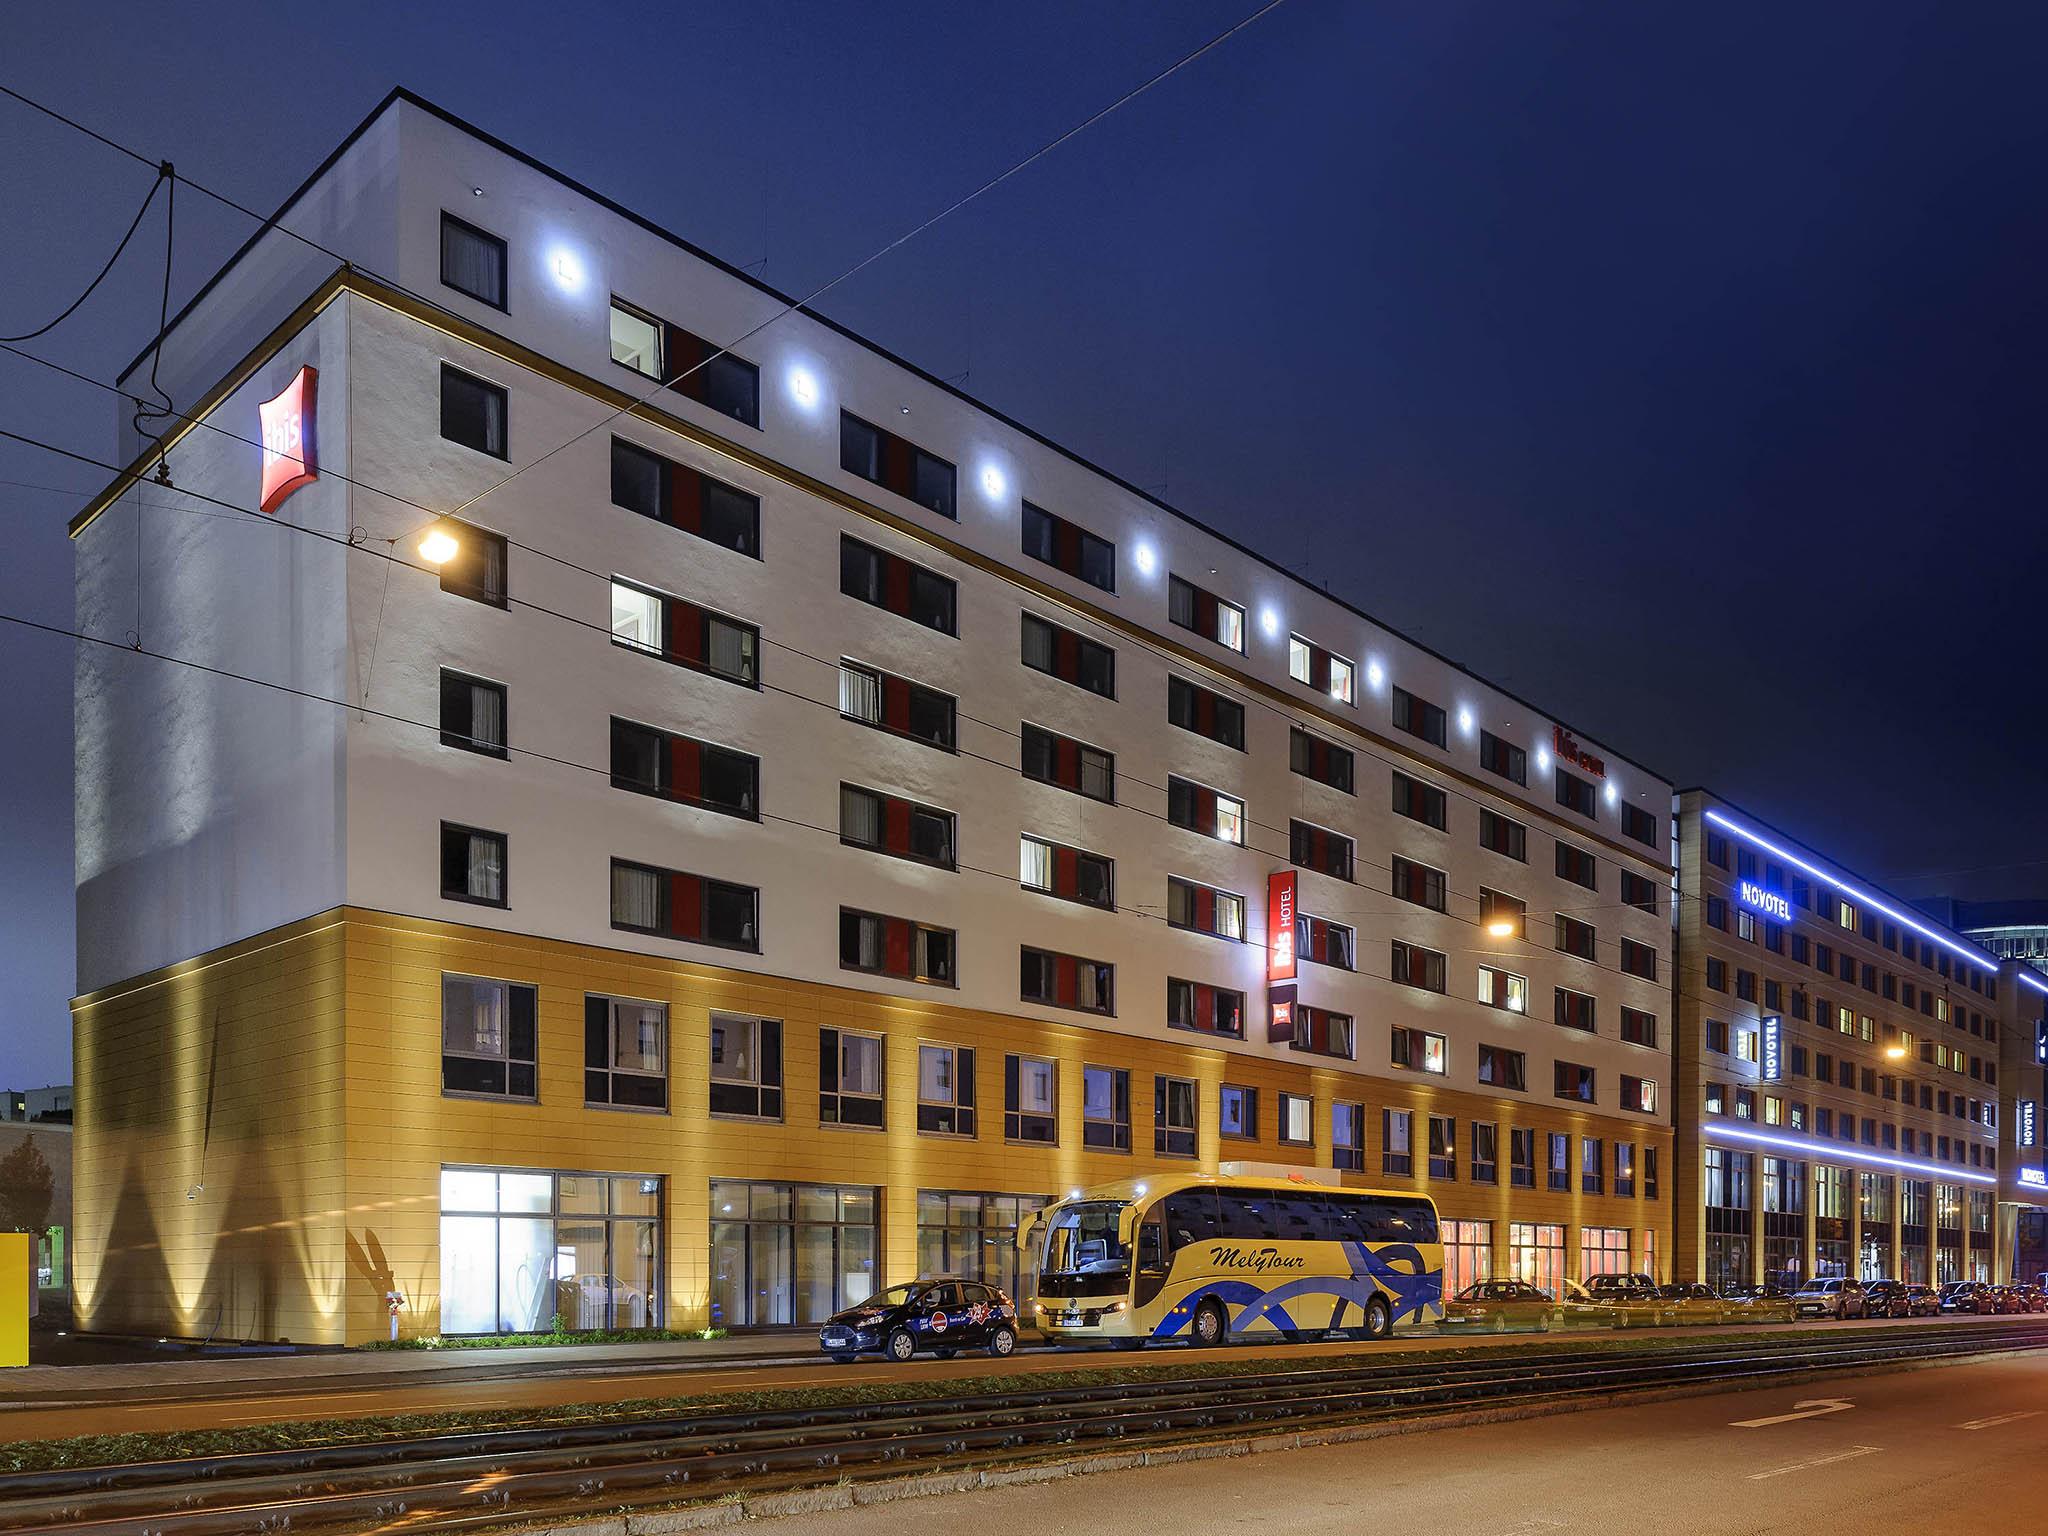 فندق - Ibis إيبيس مونشن سيتي أرنولفبارك